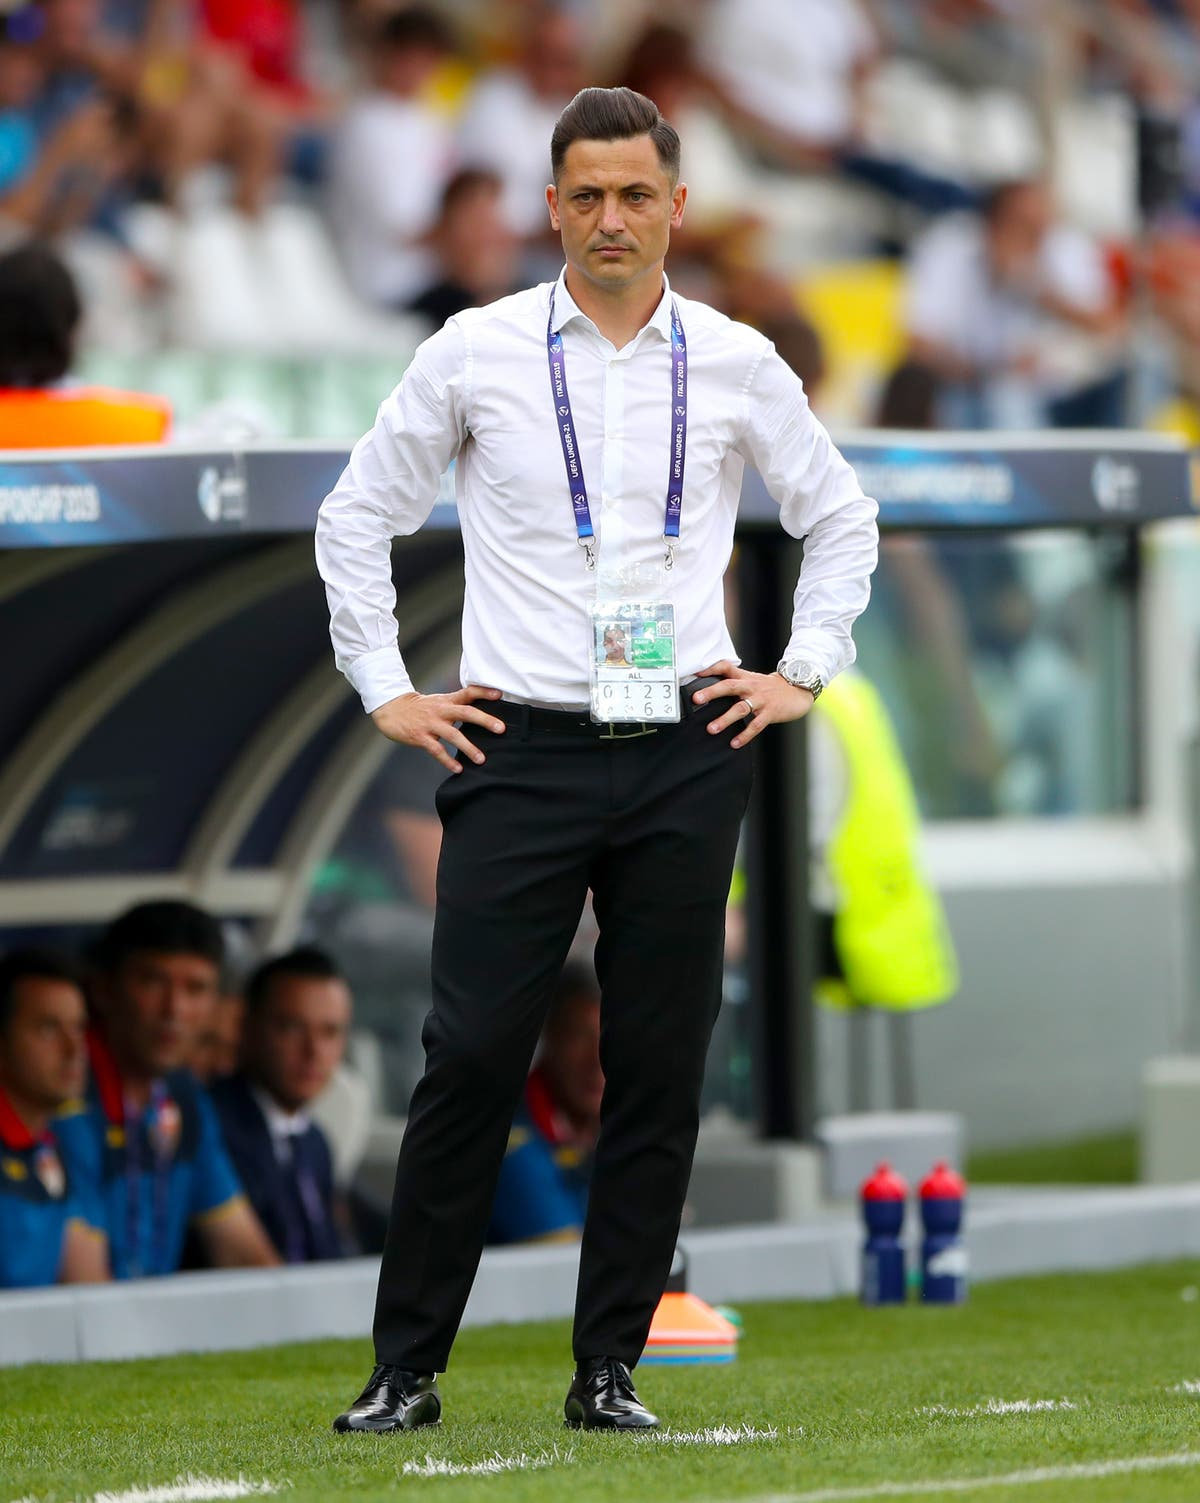 Romania boss Mirel Radoi urges caution against England's attacking 'threats'